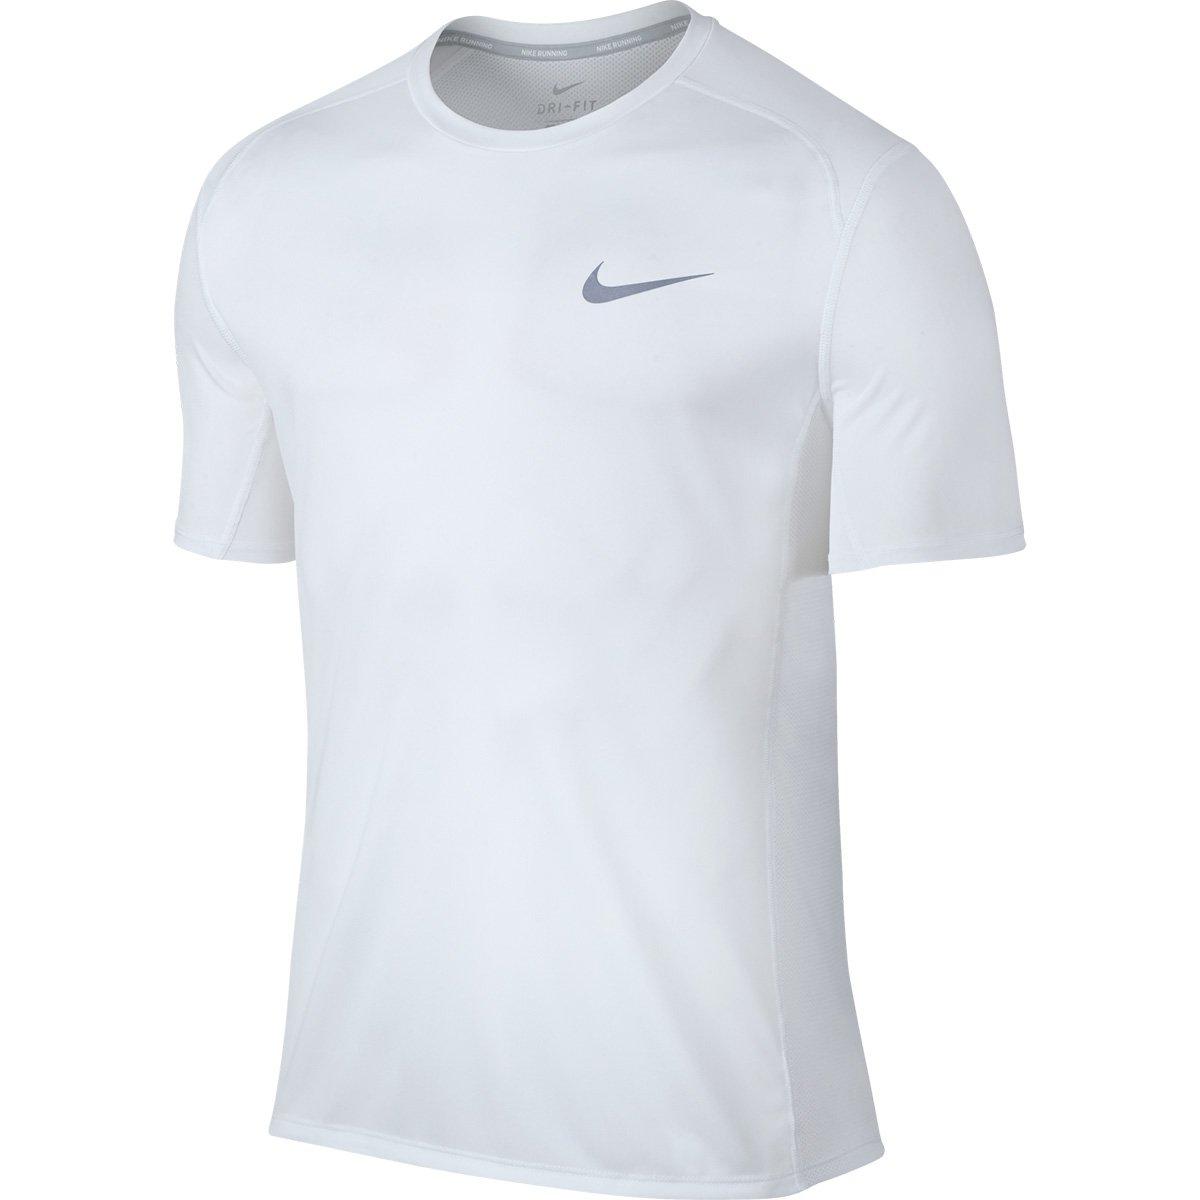 1386d25c627e2 Camiseta Nike Dri-Fit Miler SS Masculina - Branco - Compre Agora ...